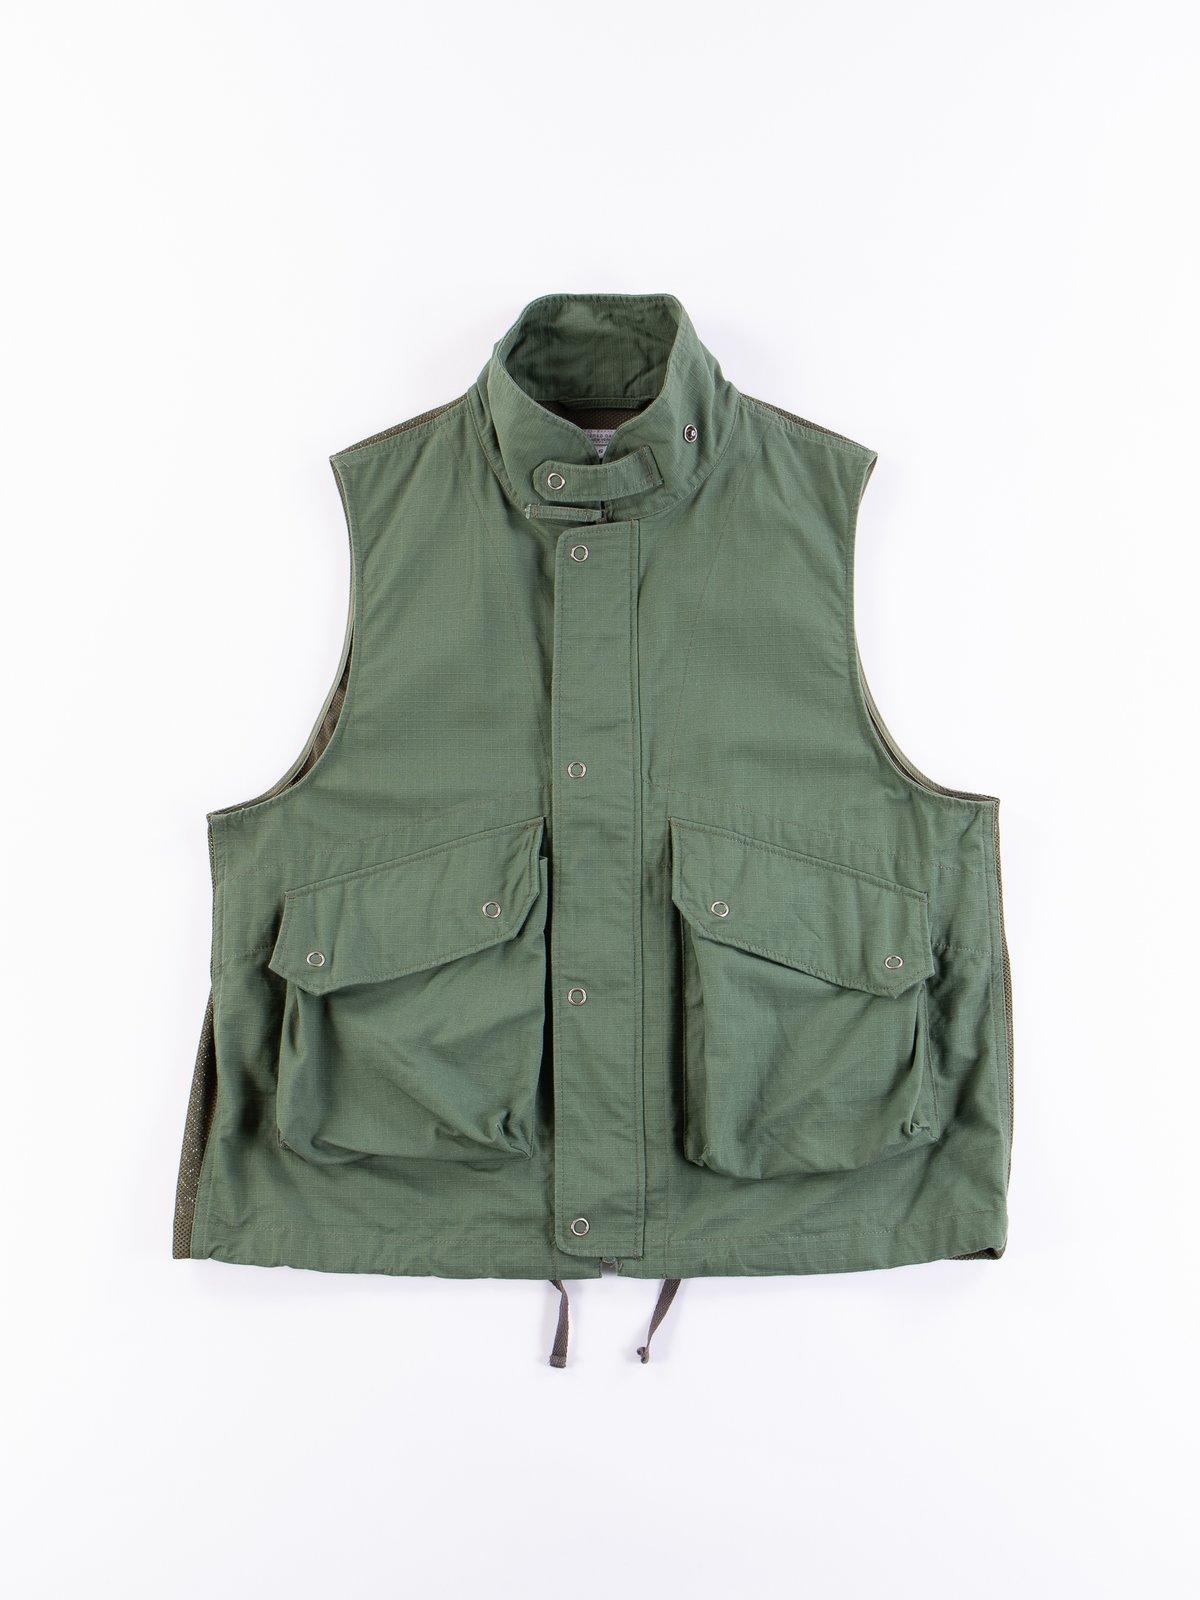 Olive Cotton Ripstop Field Vest - Image 1